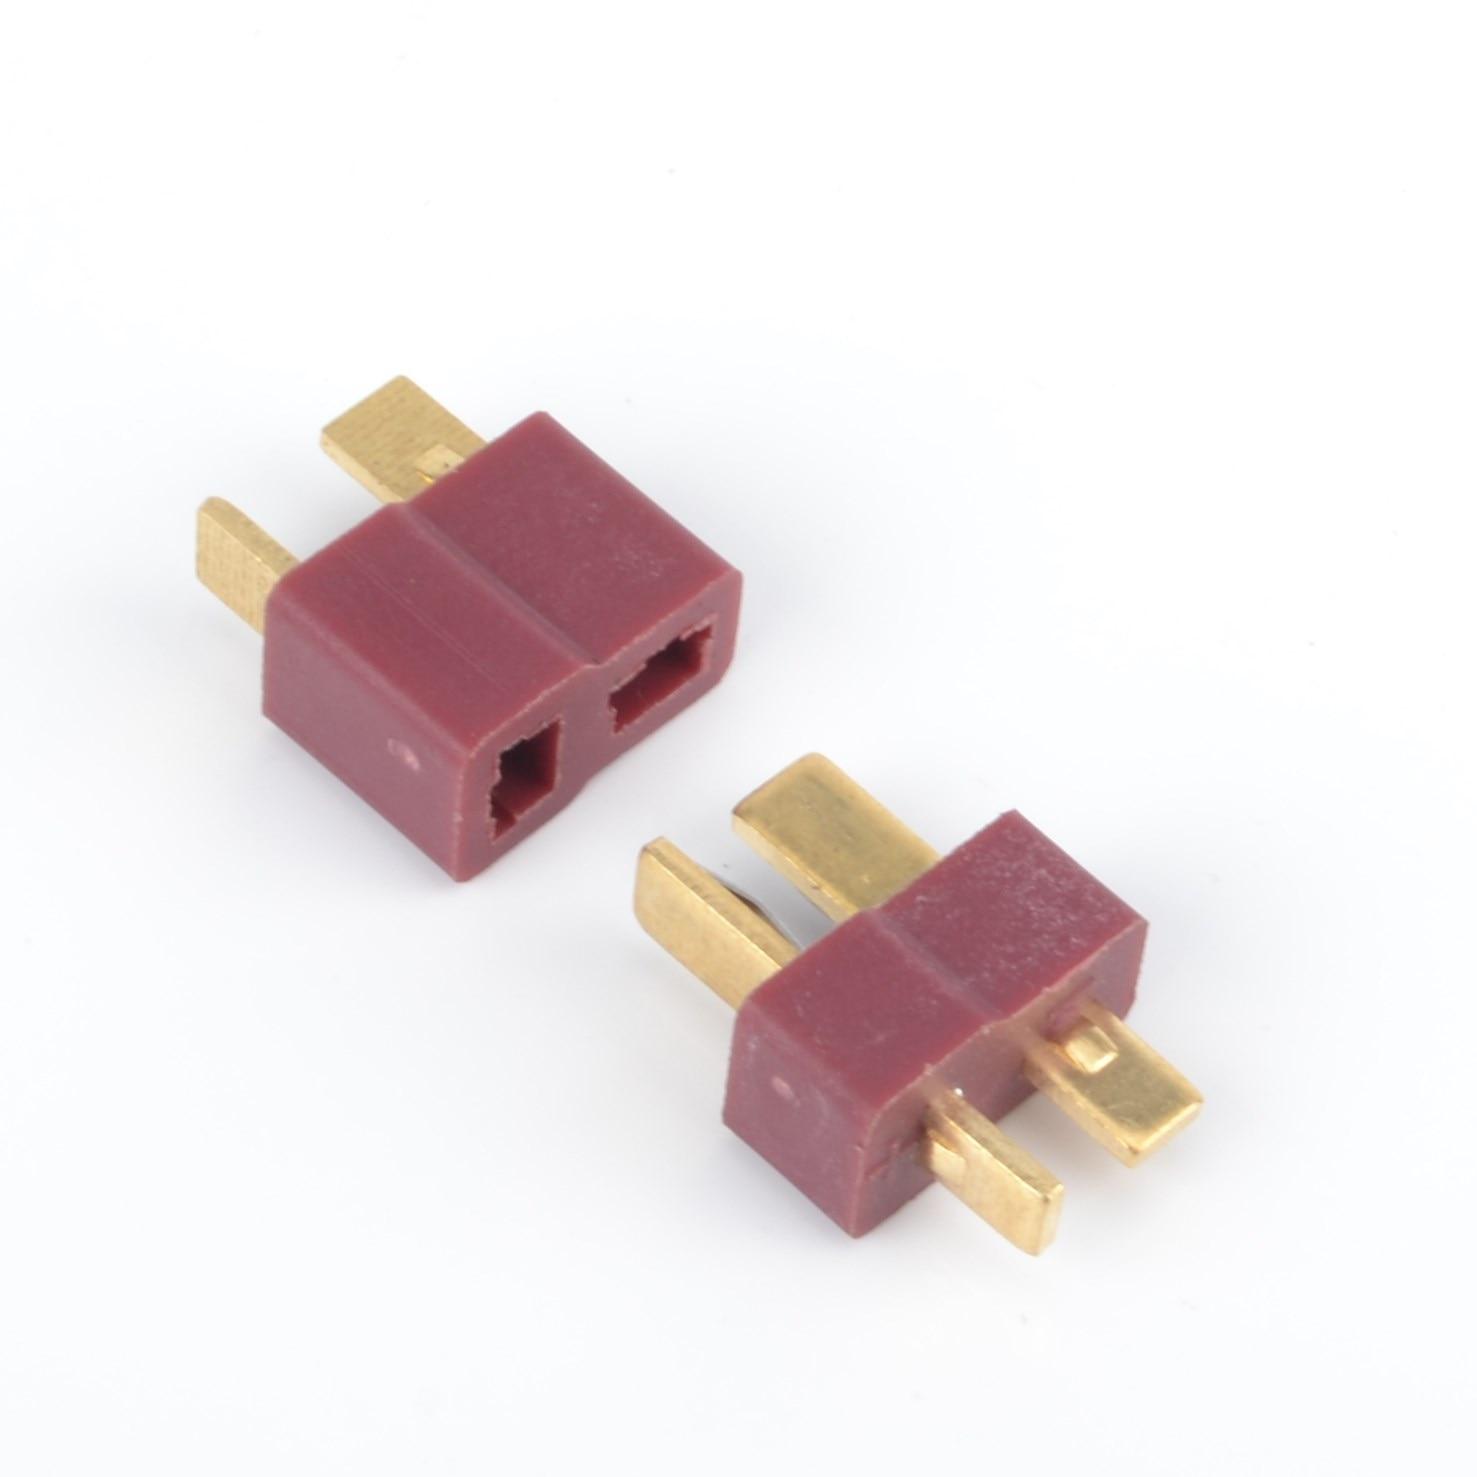 Male /& Female Deans T Plug//Connector//Socket for RC Lipo Battery 12v 24v DC LiPo